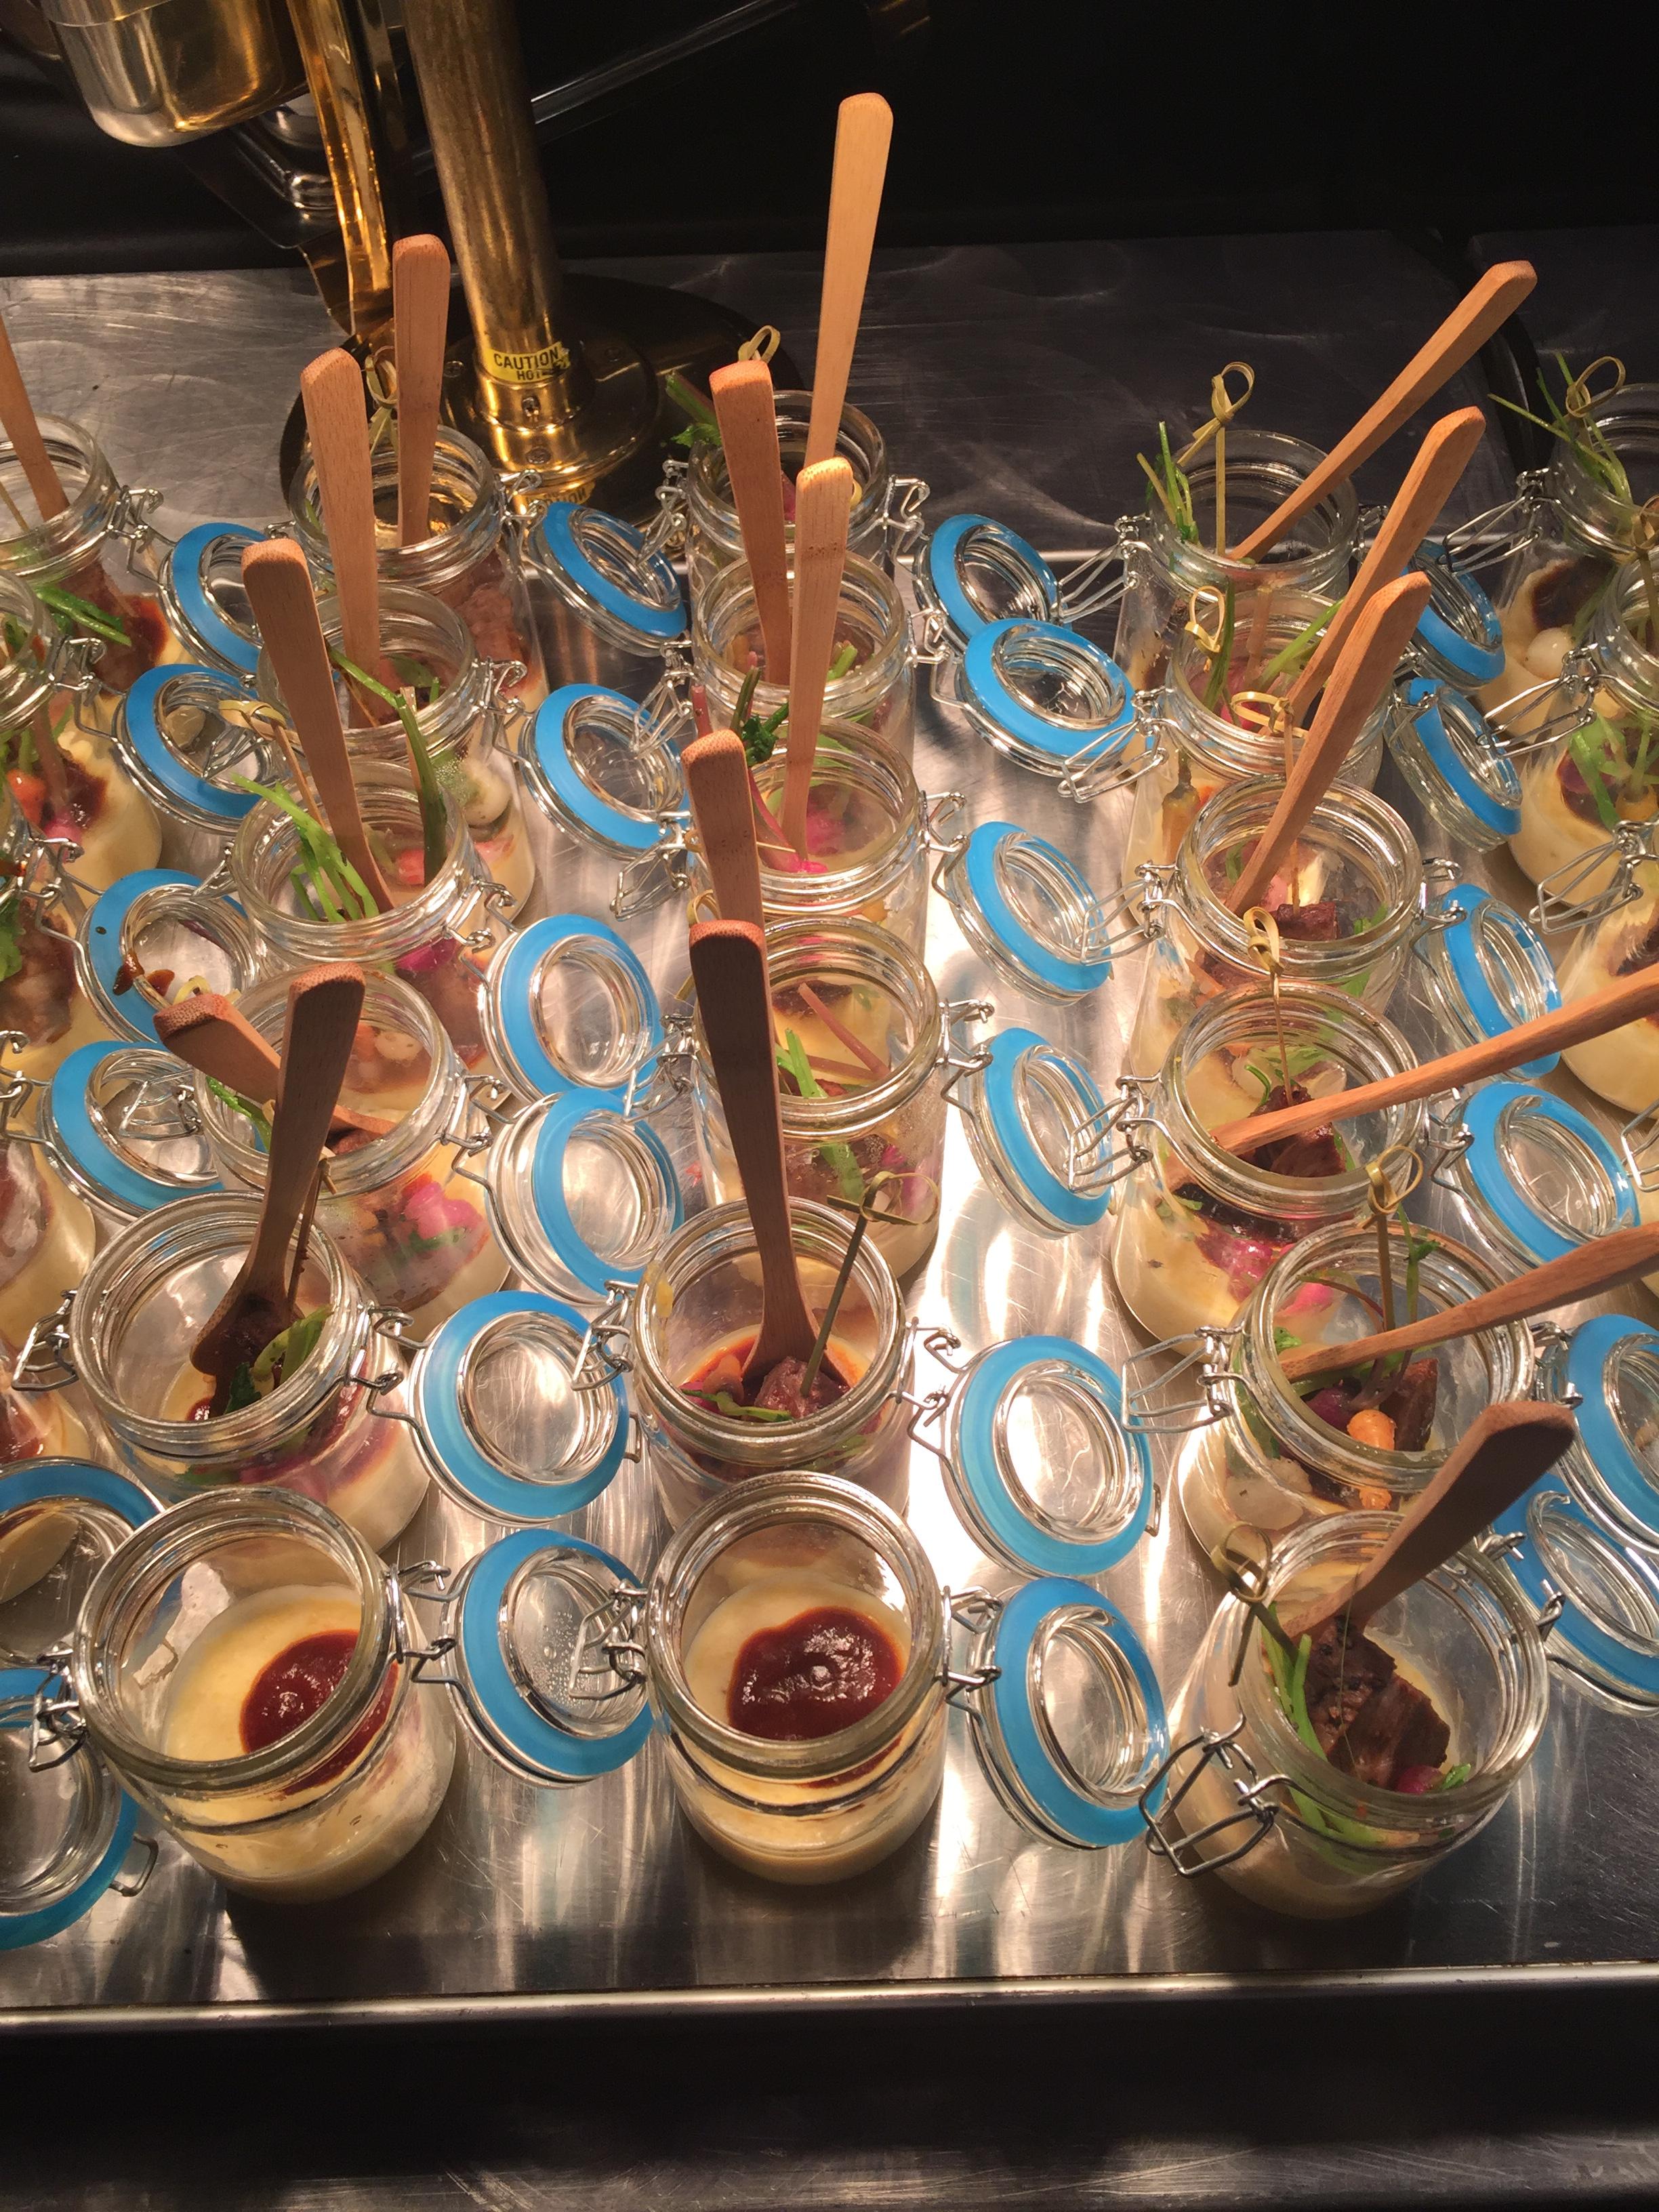 Grits in mason jars.....YUM! The party food was delish! #partyfood #masonjar #entertaining